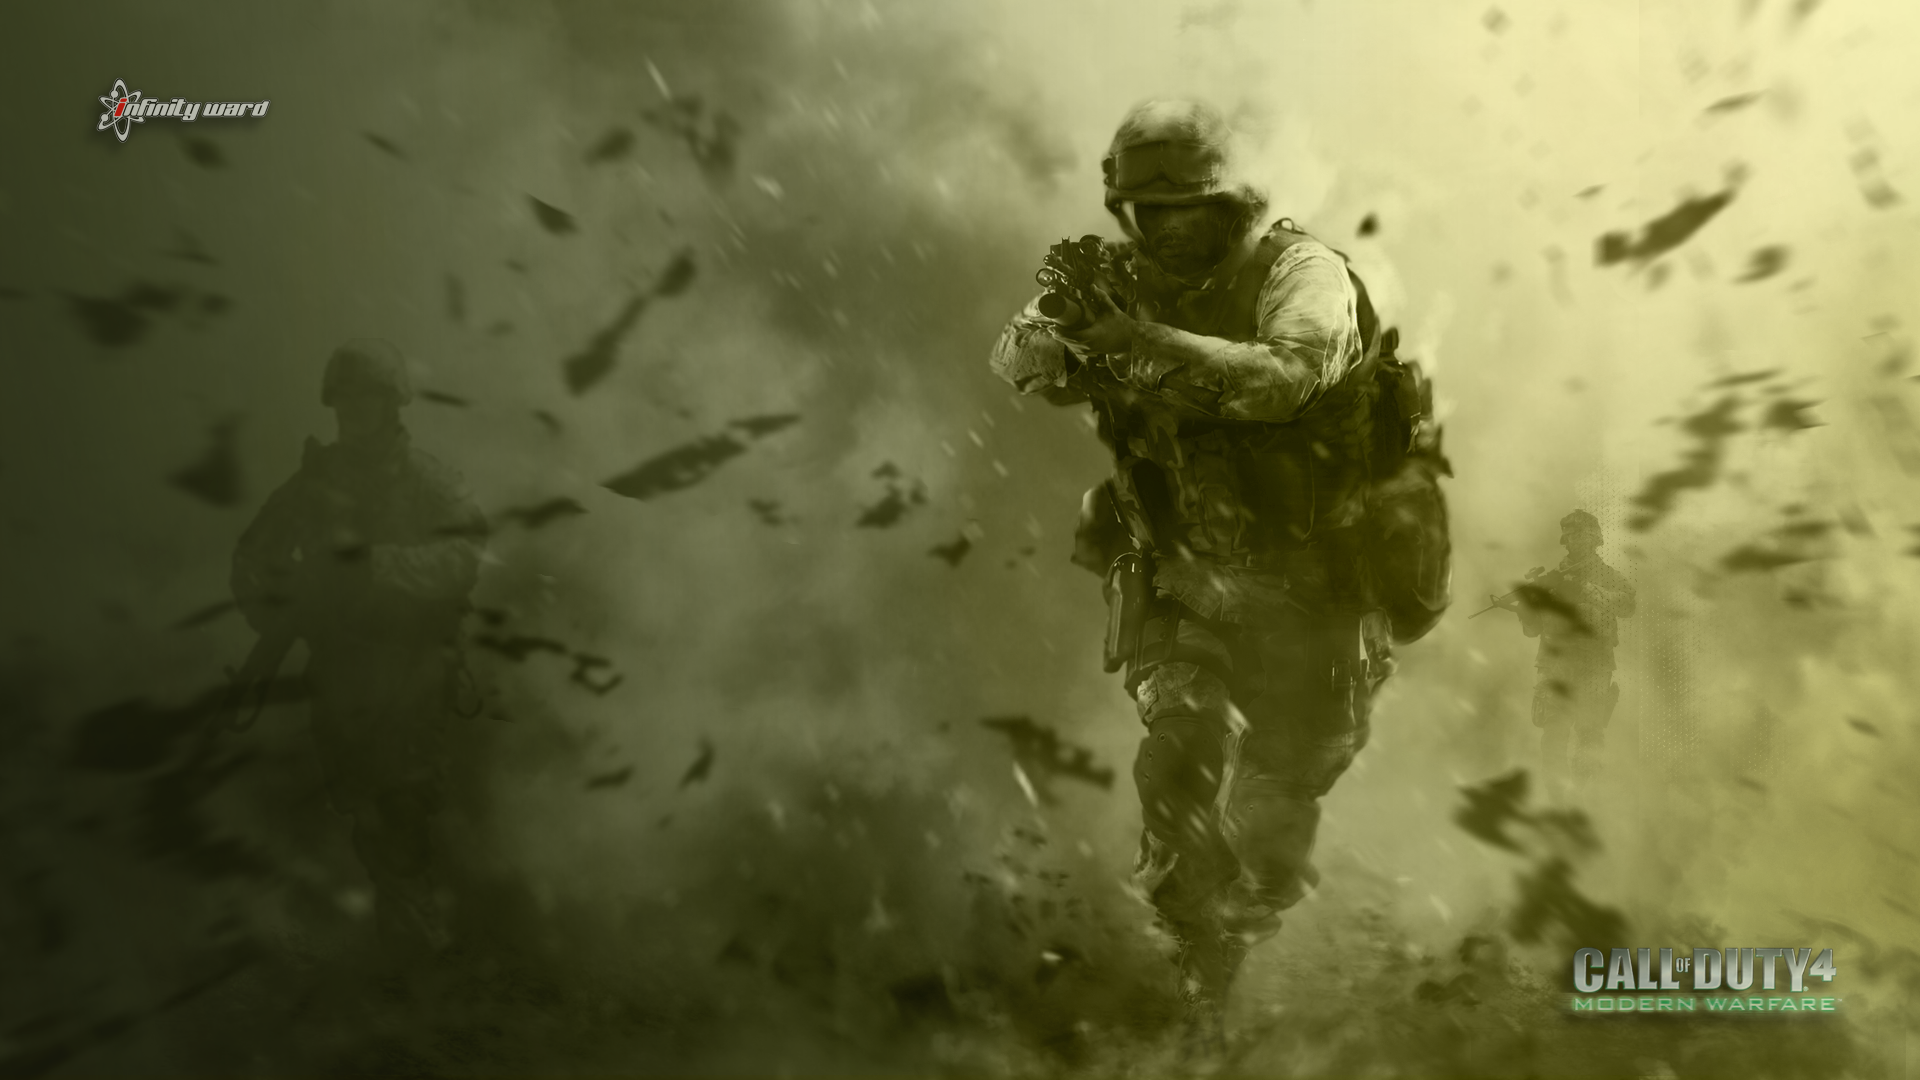 Call Of Duty Modern Warfare Remastered Needs Infinite Warfare Disc To Run Call Of Duty Call Of Duty Multiplayer Call Of Duty Infinite